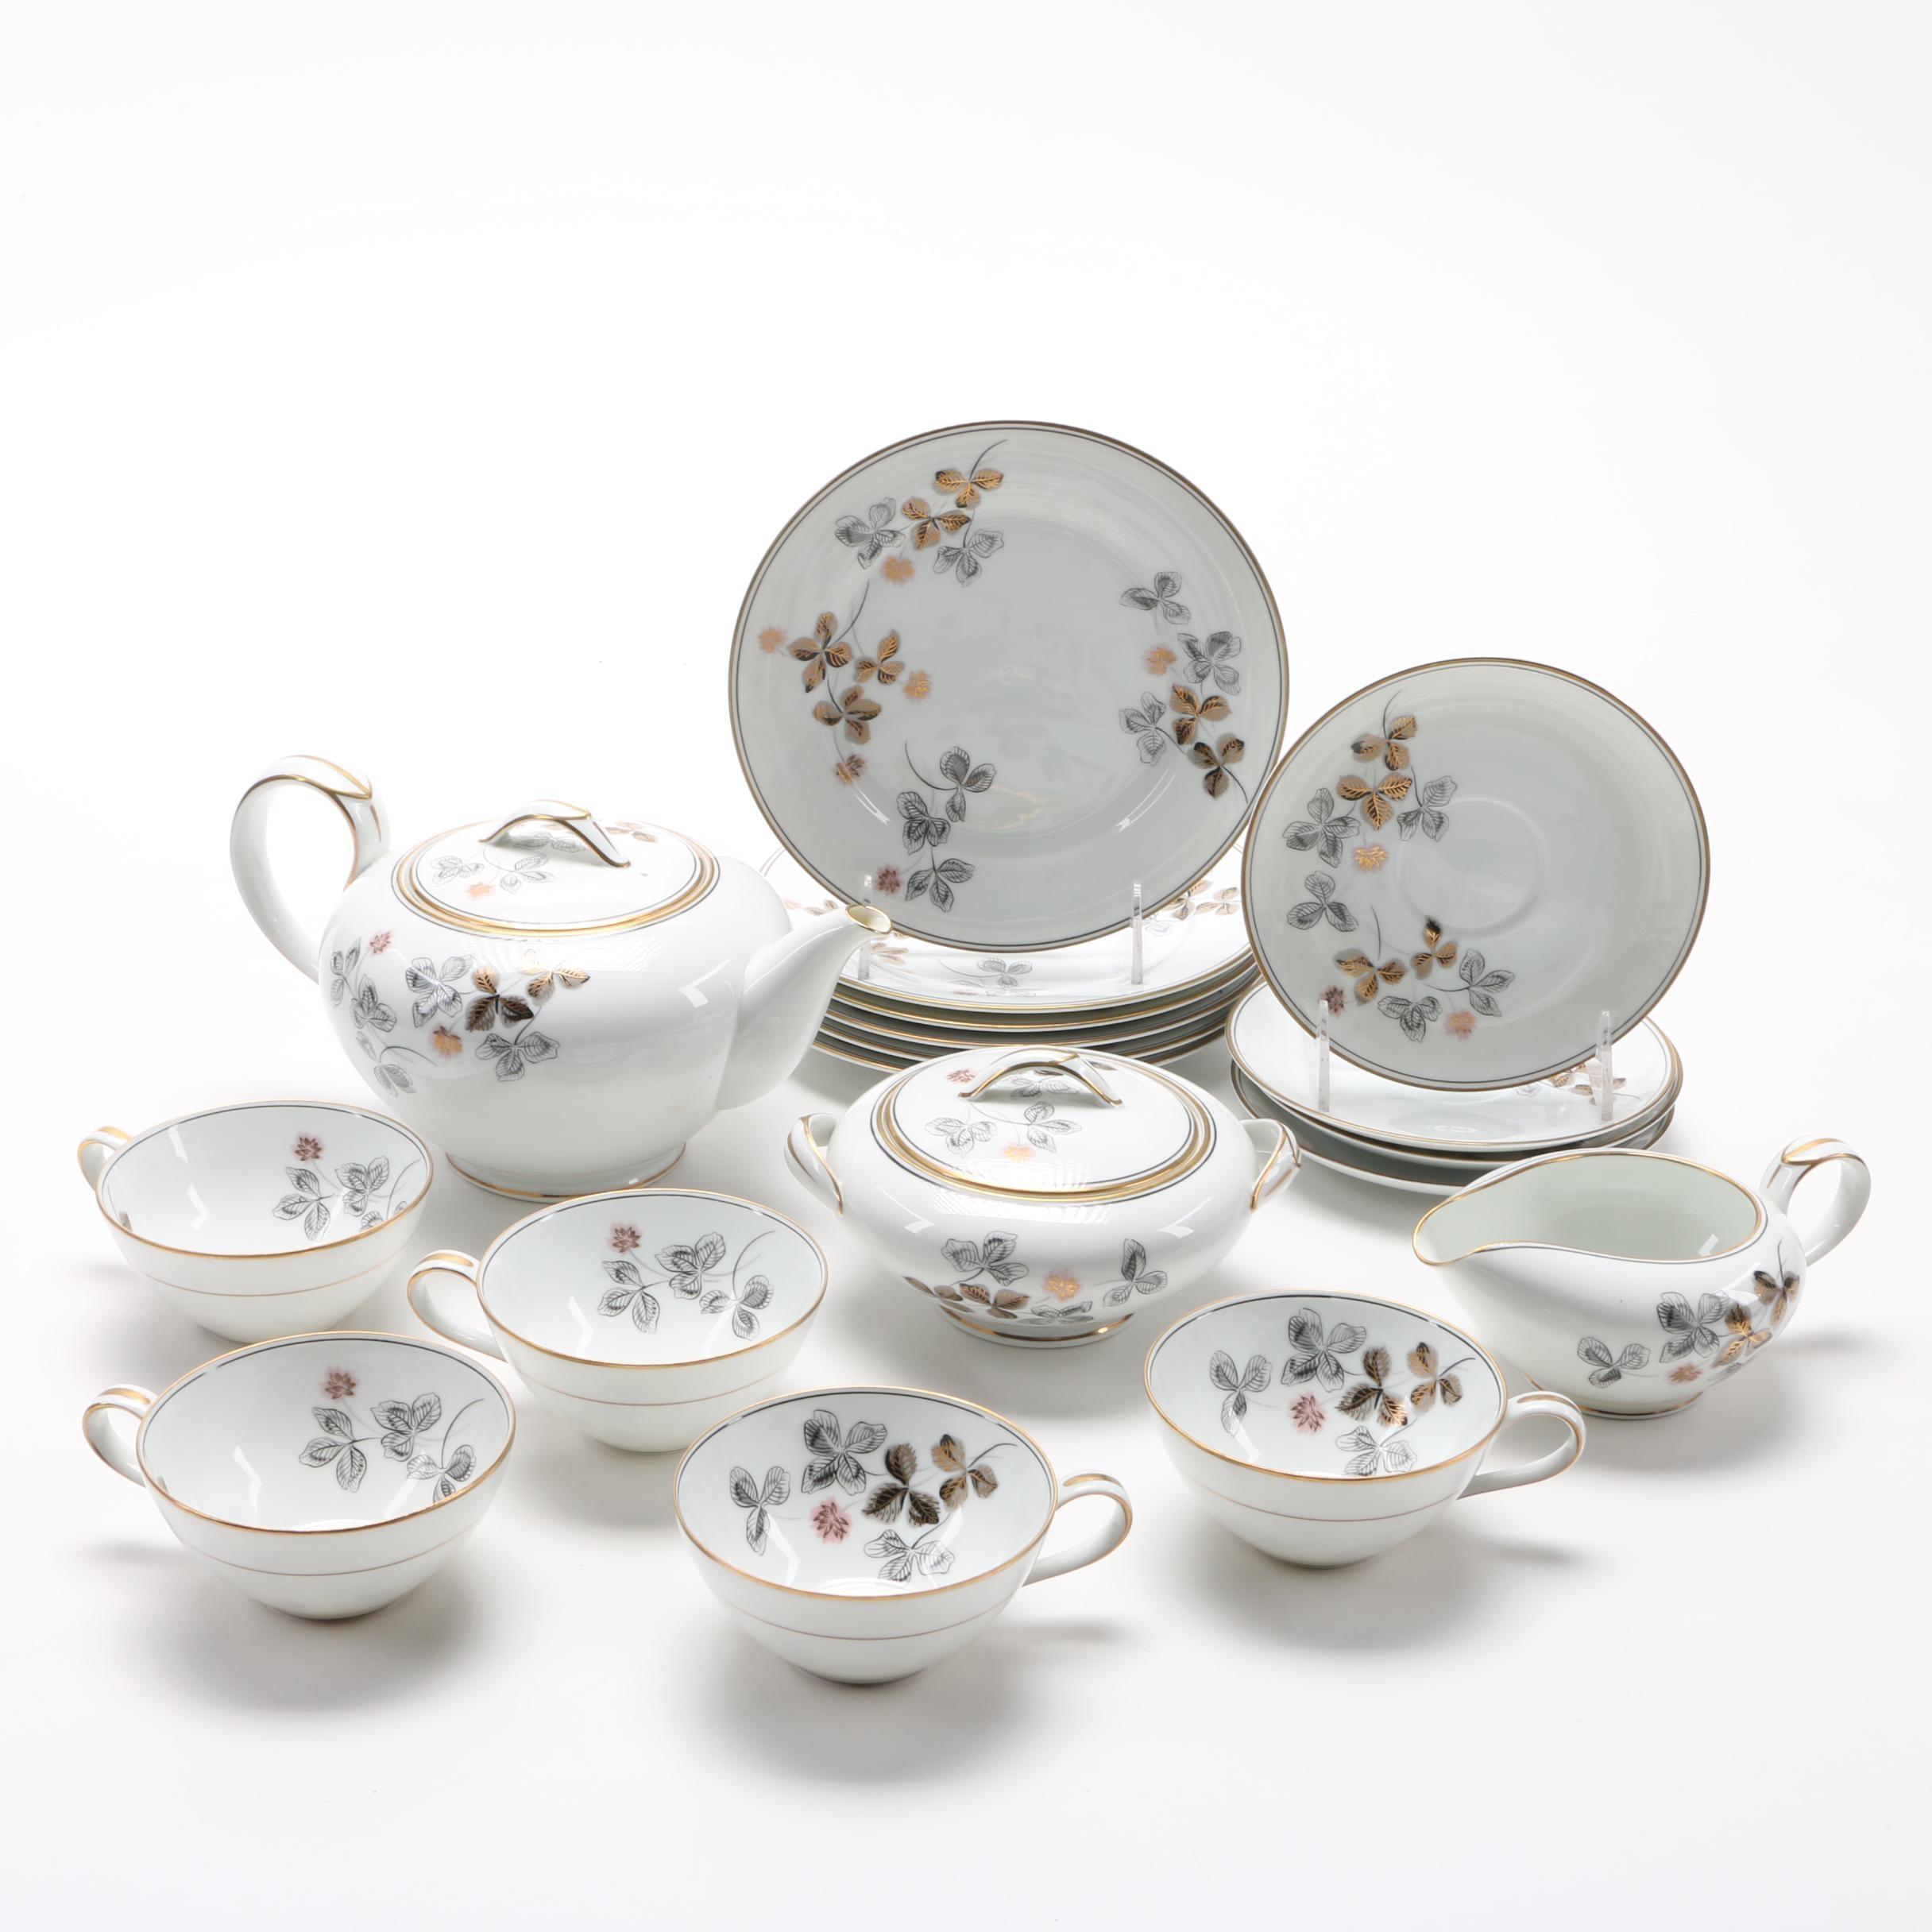 Noritake Tea Set with Dessert Plates ...  sc 1 st  EBTH.com & Noritake Tea Set with Dessert Plates : EBTH